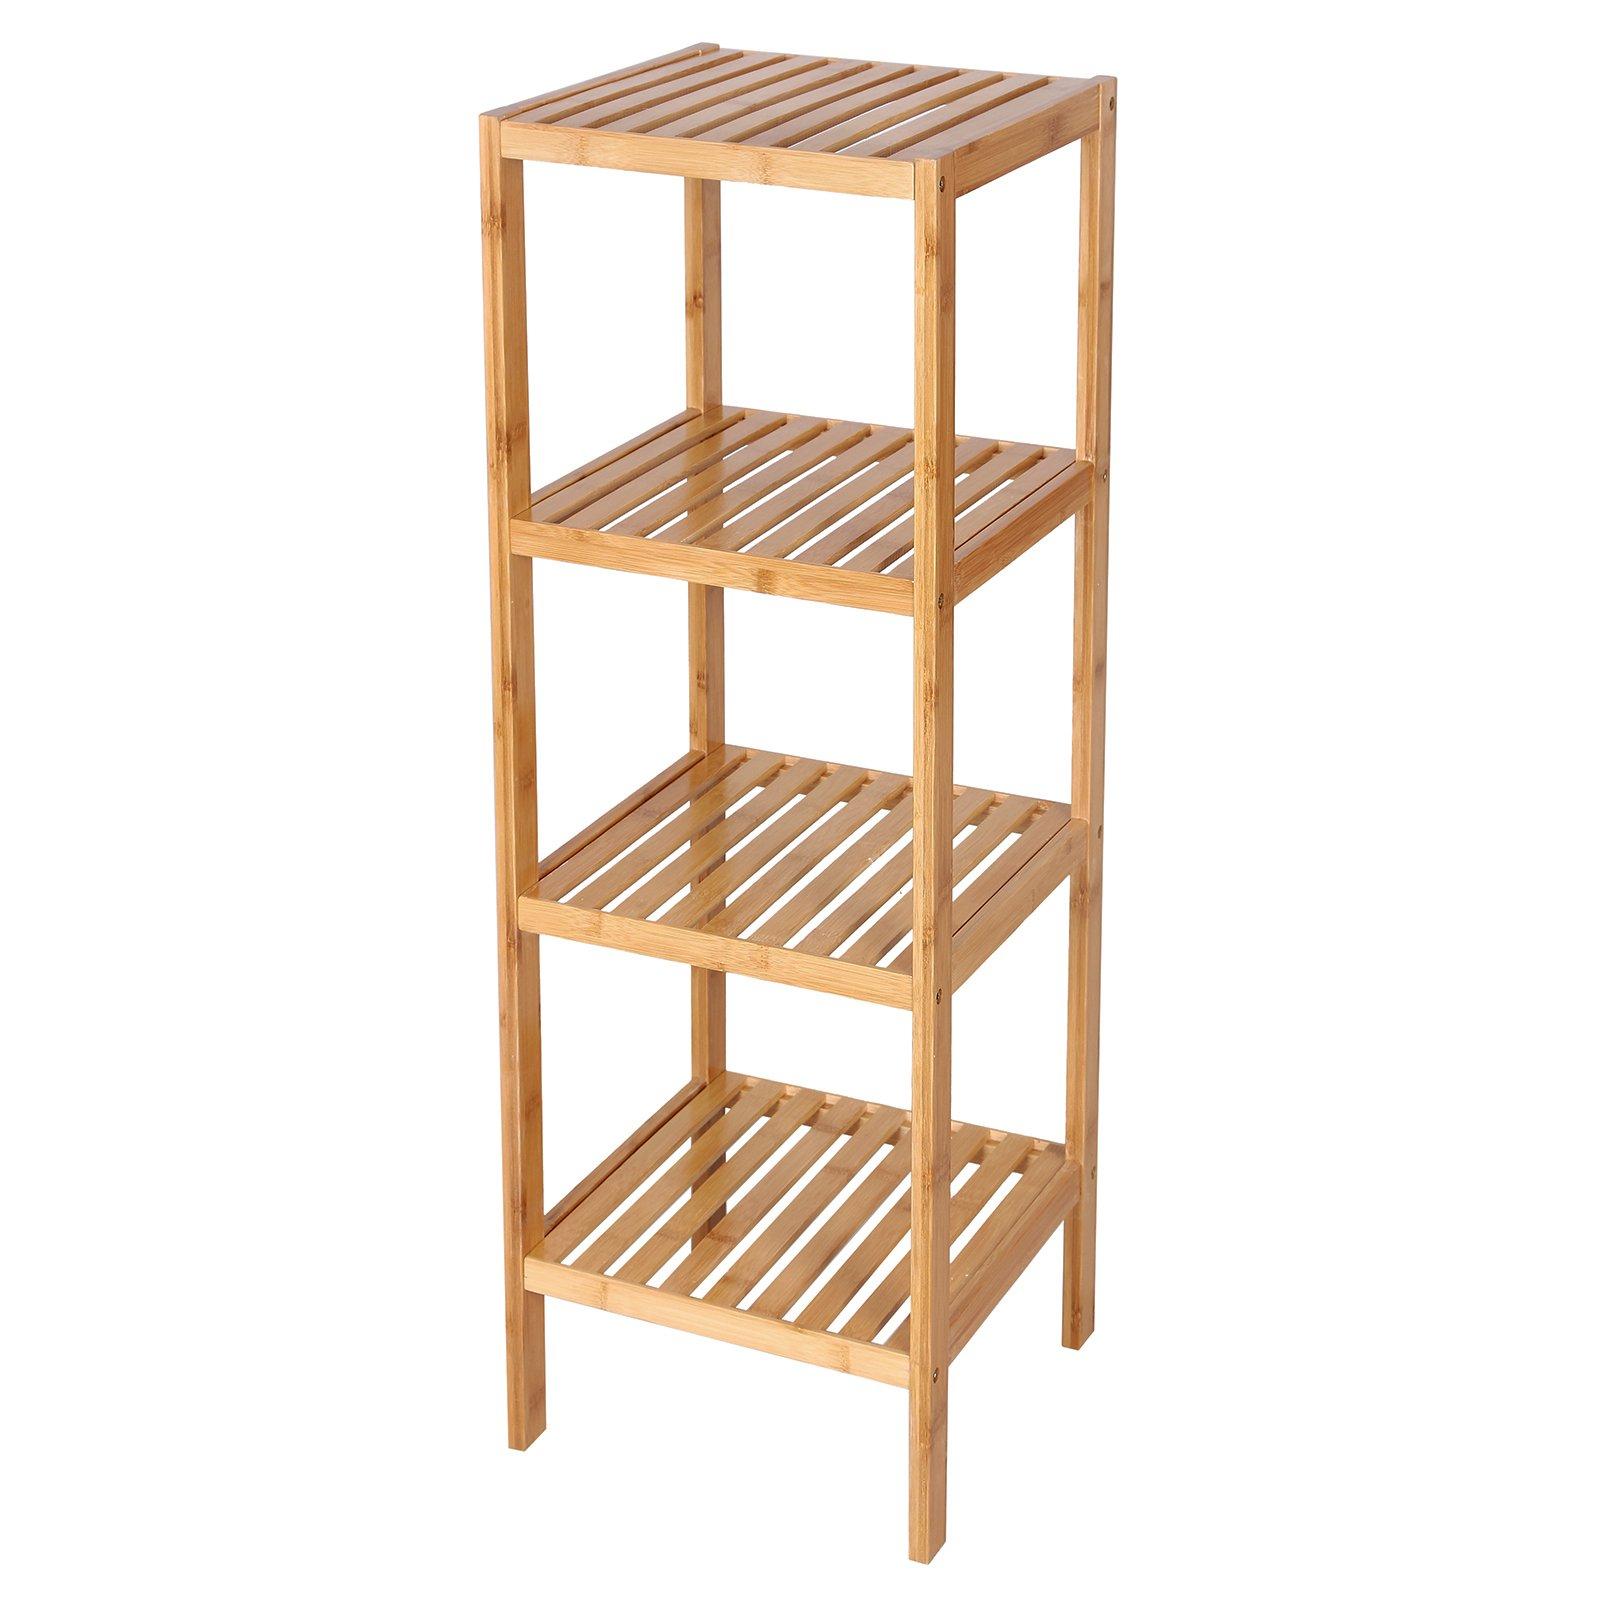 SONGMICS 100% Bamboo Bathroom Shelf 4-Tier Multifunctional Storage Rack Shelving Unit 38 5/8'' x 12 7/8'' x 12 7/8'' UBCB54Y